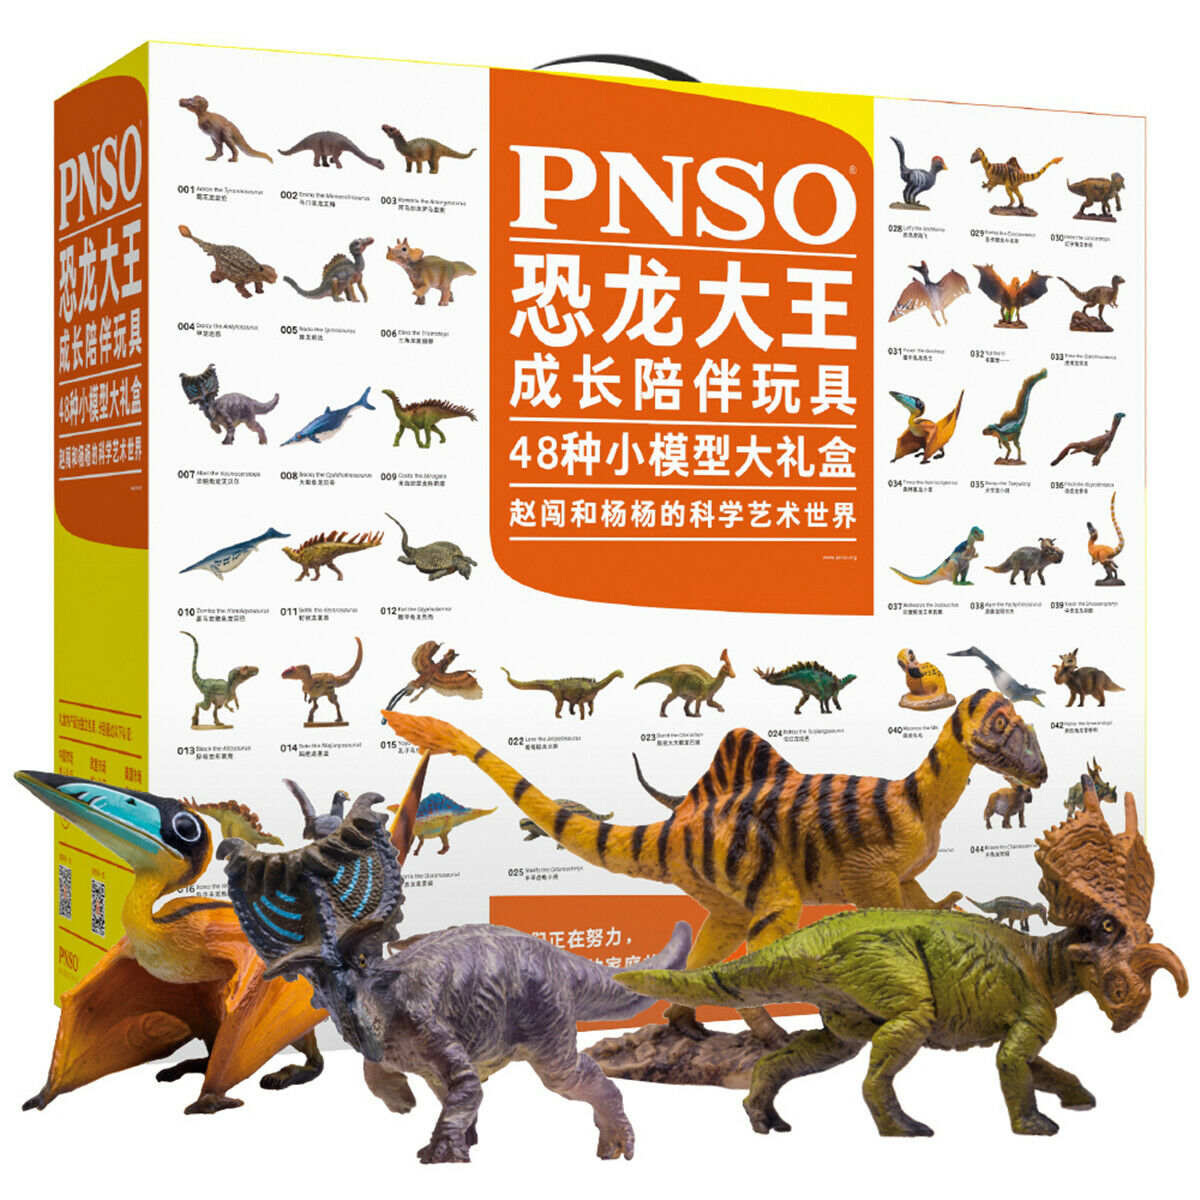 PNSO Alioramus Keichousaurus Spinops Dakosaurus Ectenosaurus Dinosaur Figure Baryonyx Qianzhousaurus Indosuchus Olorotitan Toys